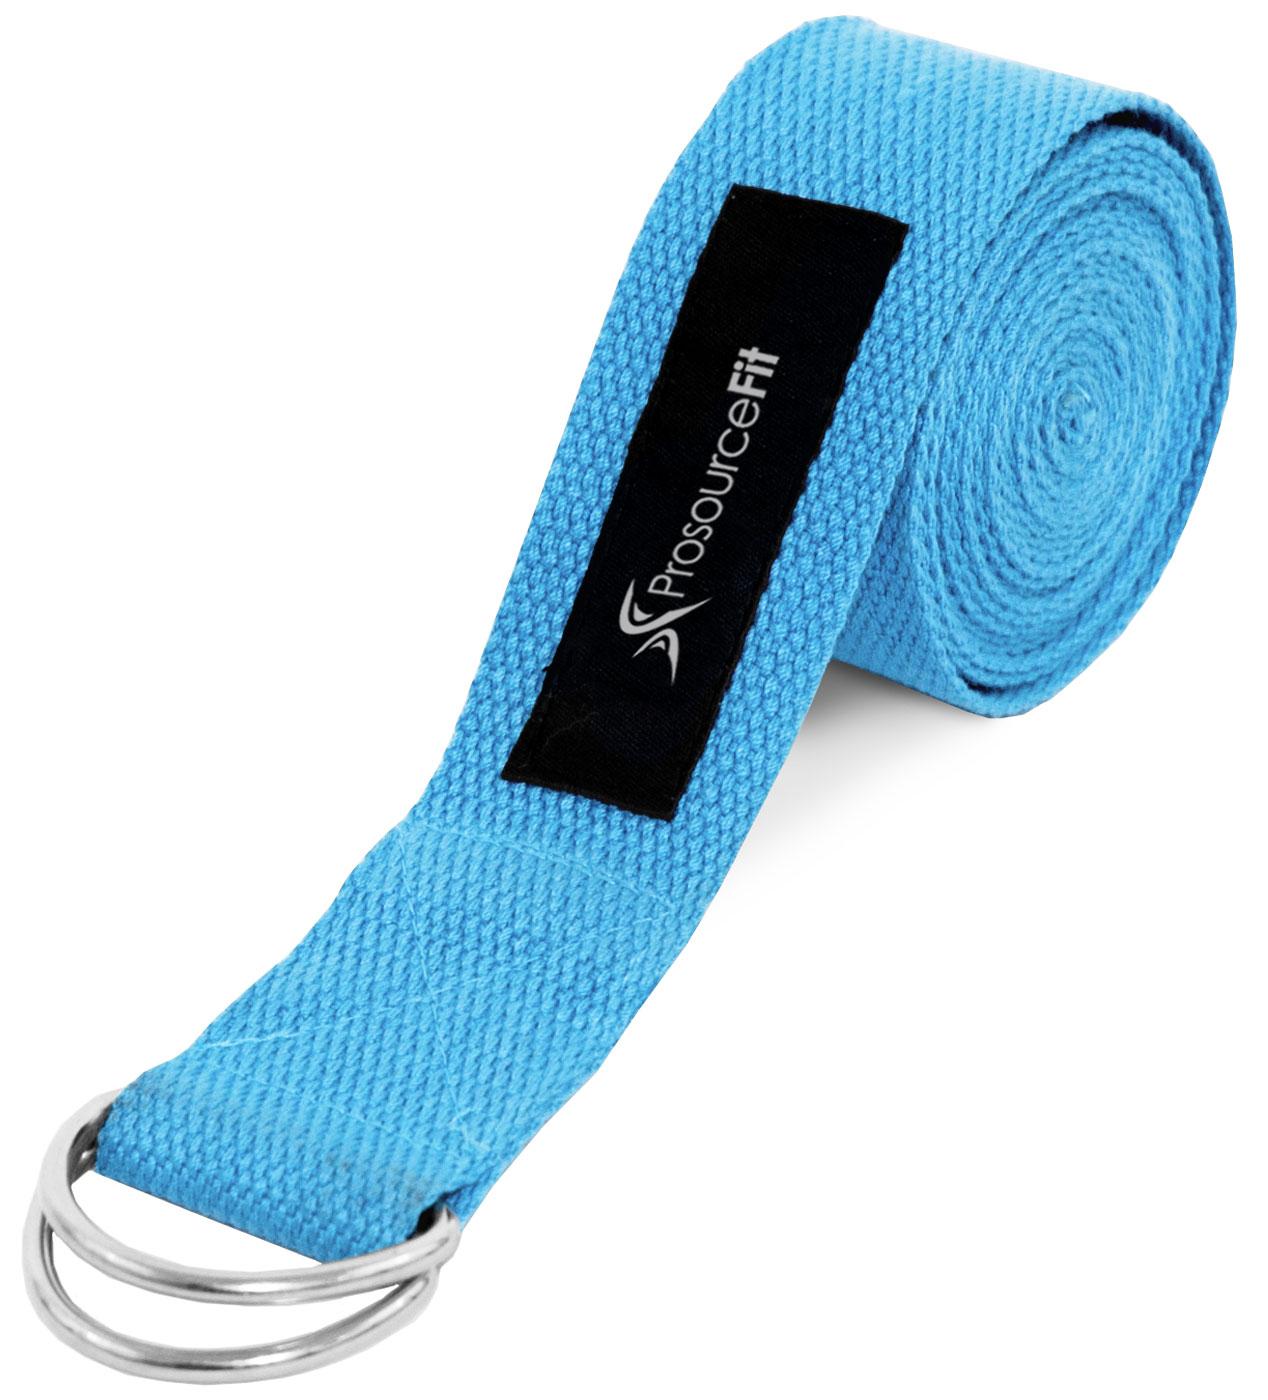 ProsourceFit Metal D-Ring 8 Ft Yoga Strap, Aqua